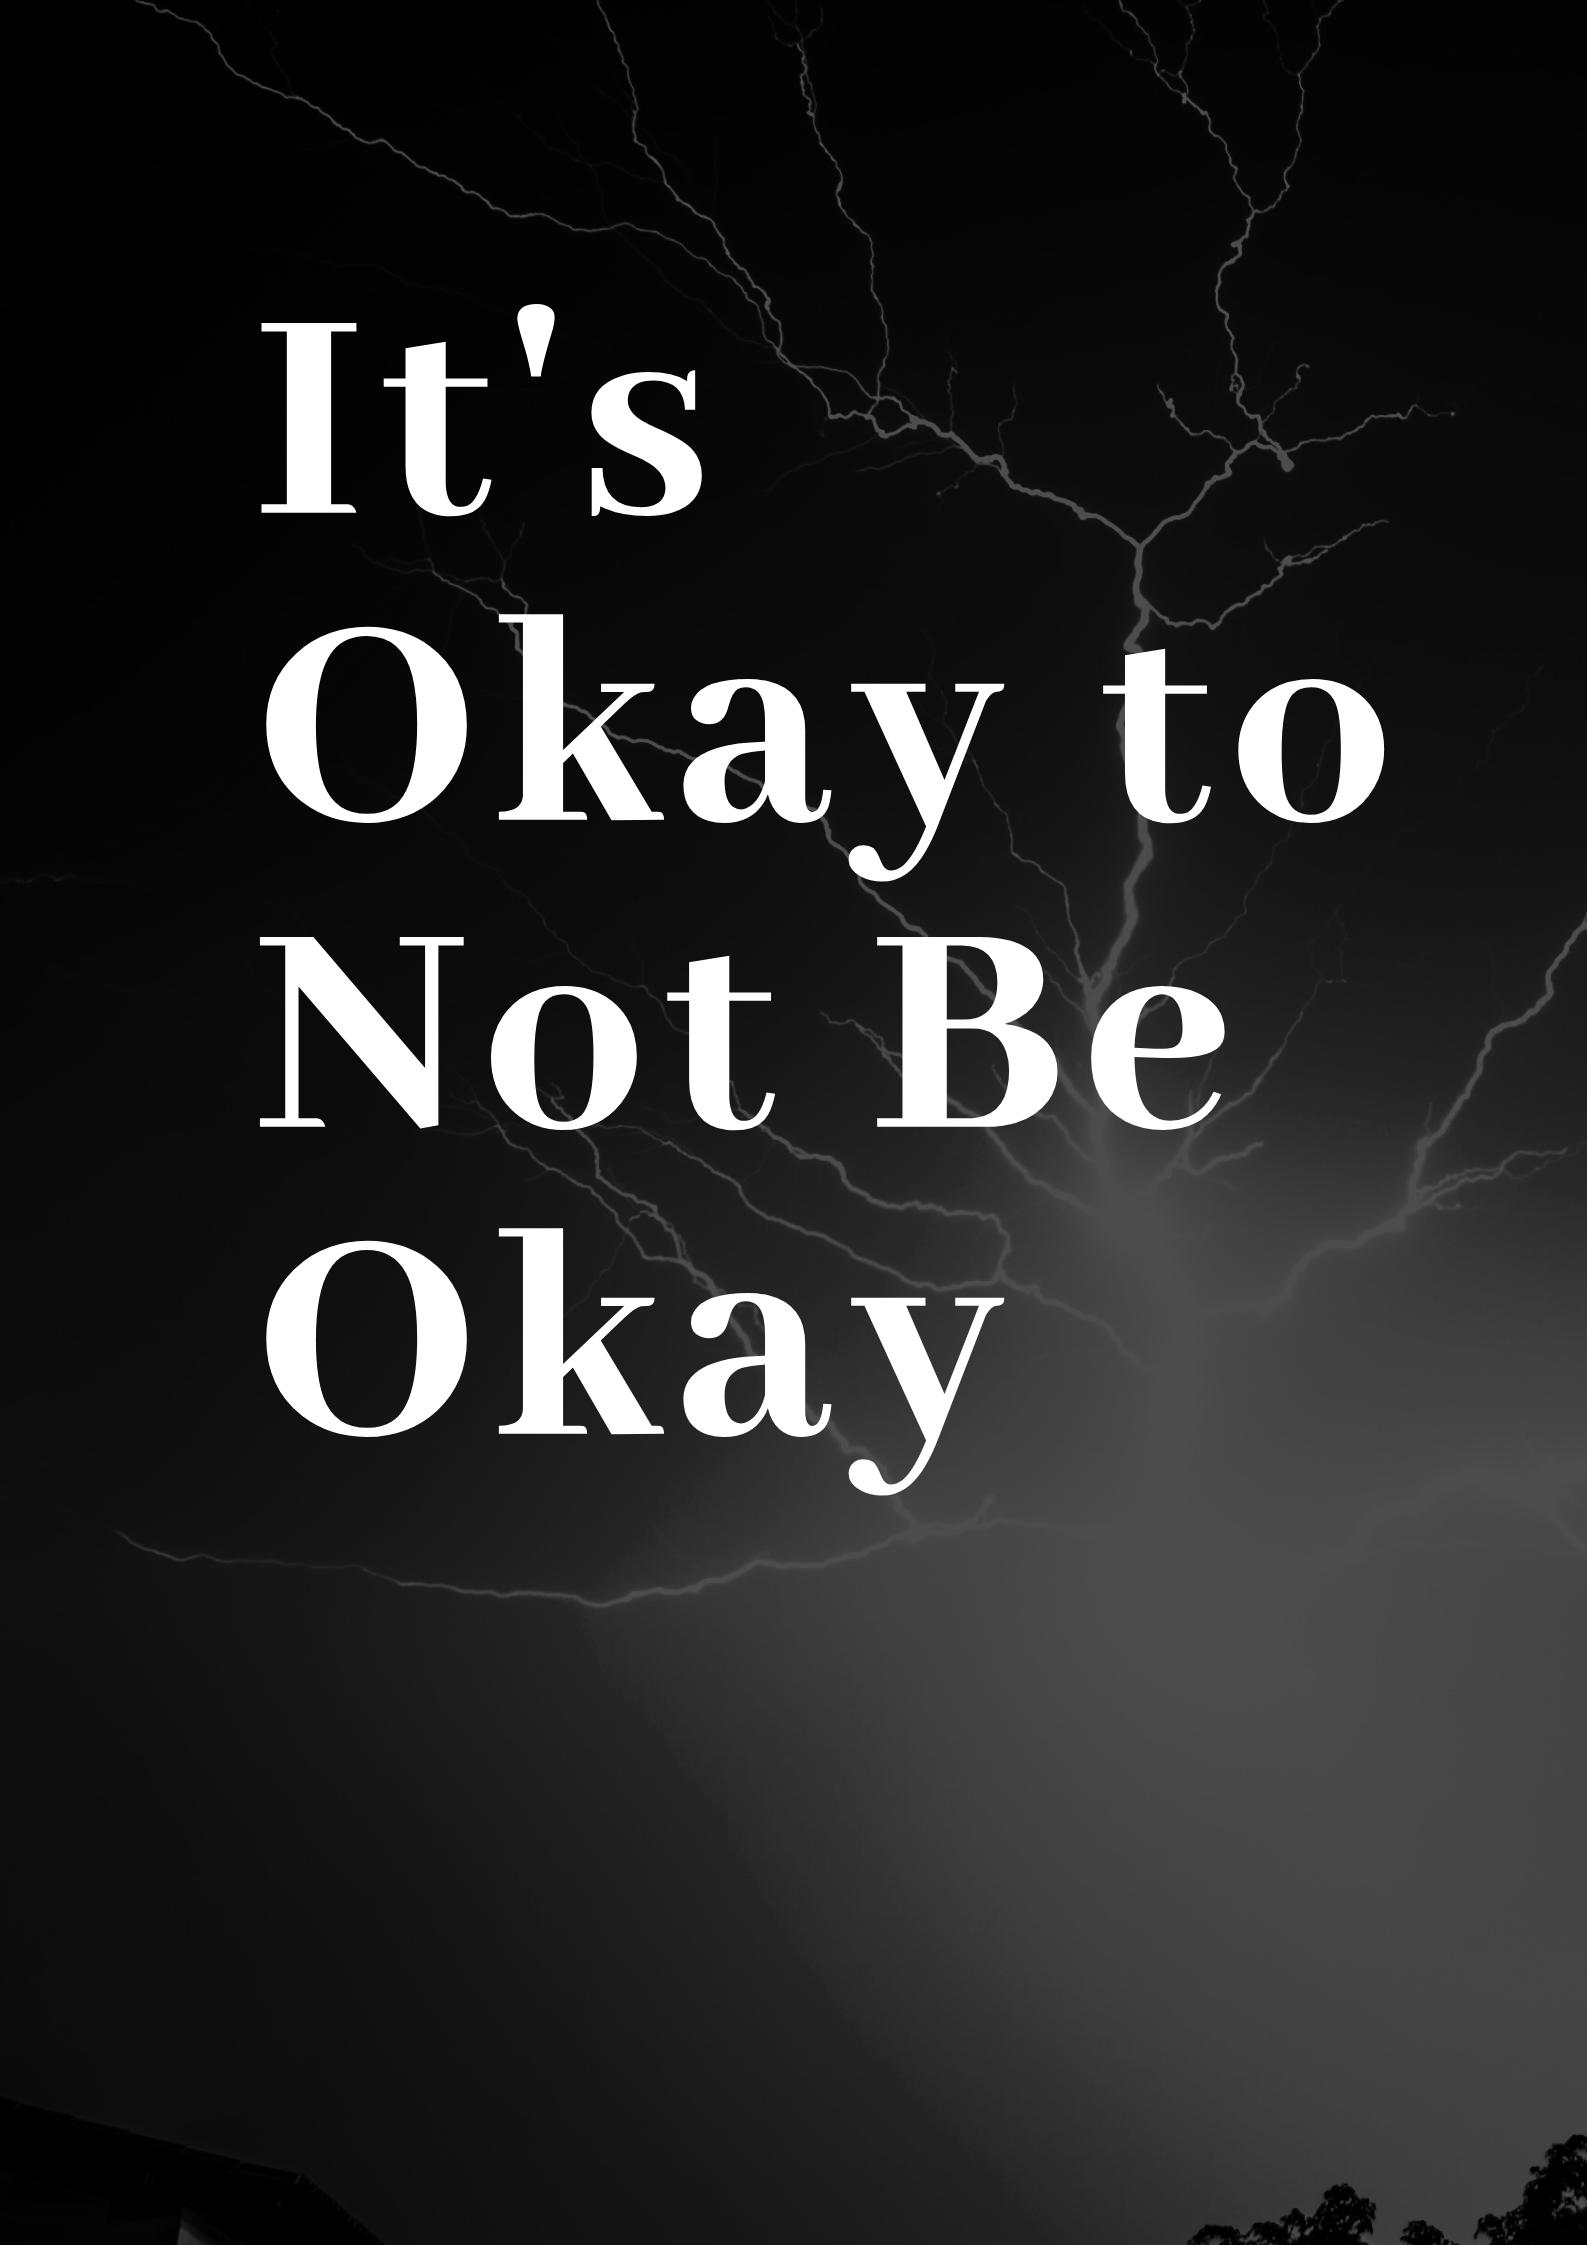 It's Ok to Not Be Okay